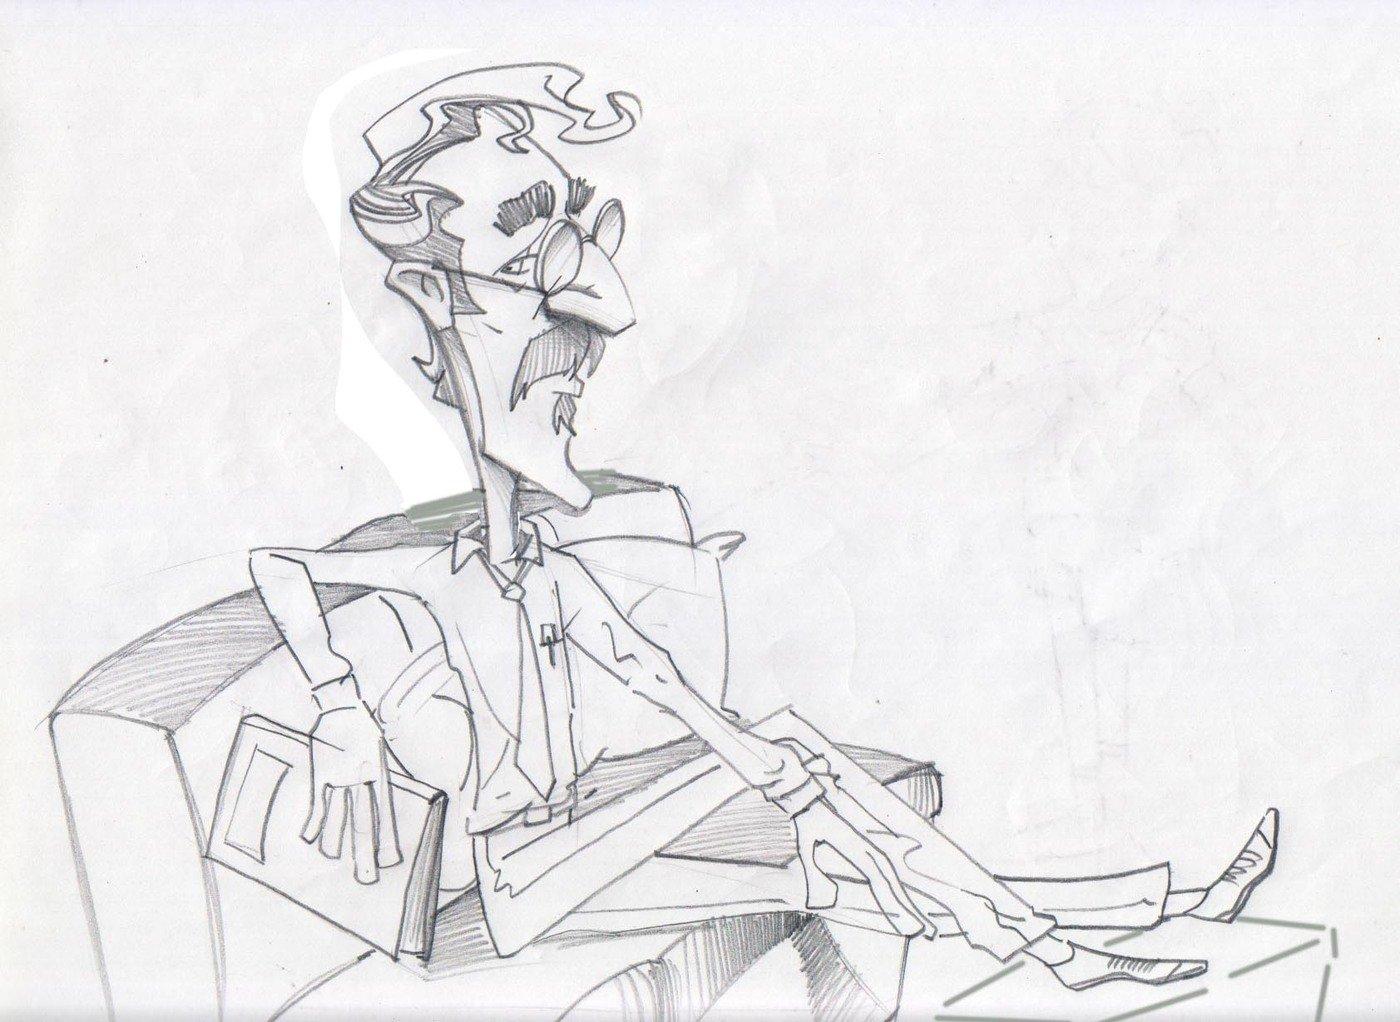 concept art by ganesh ubale at Coroflot.com